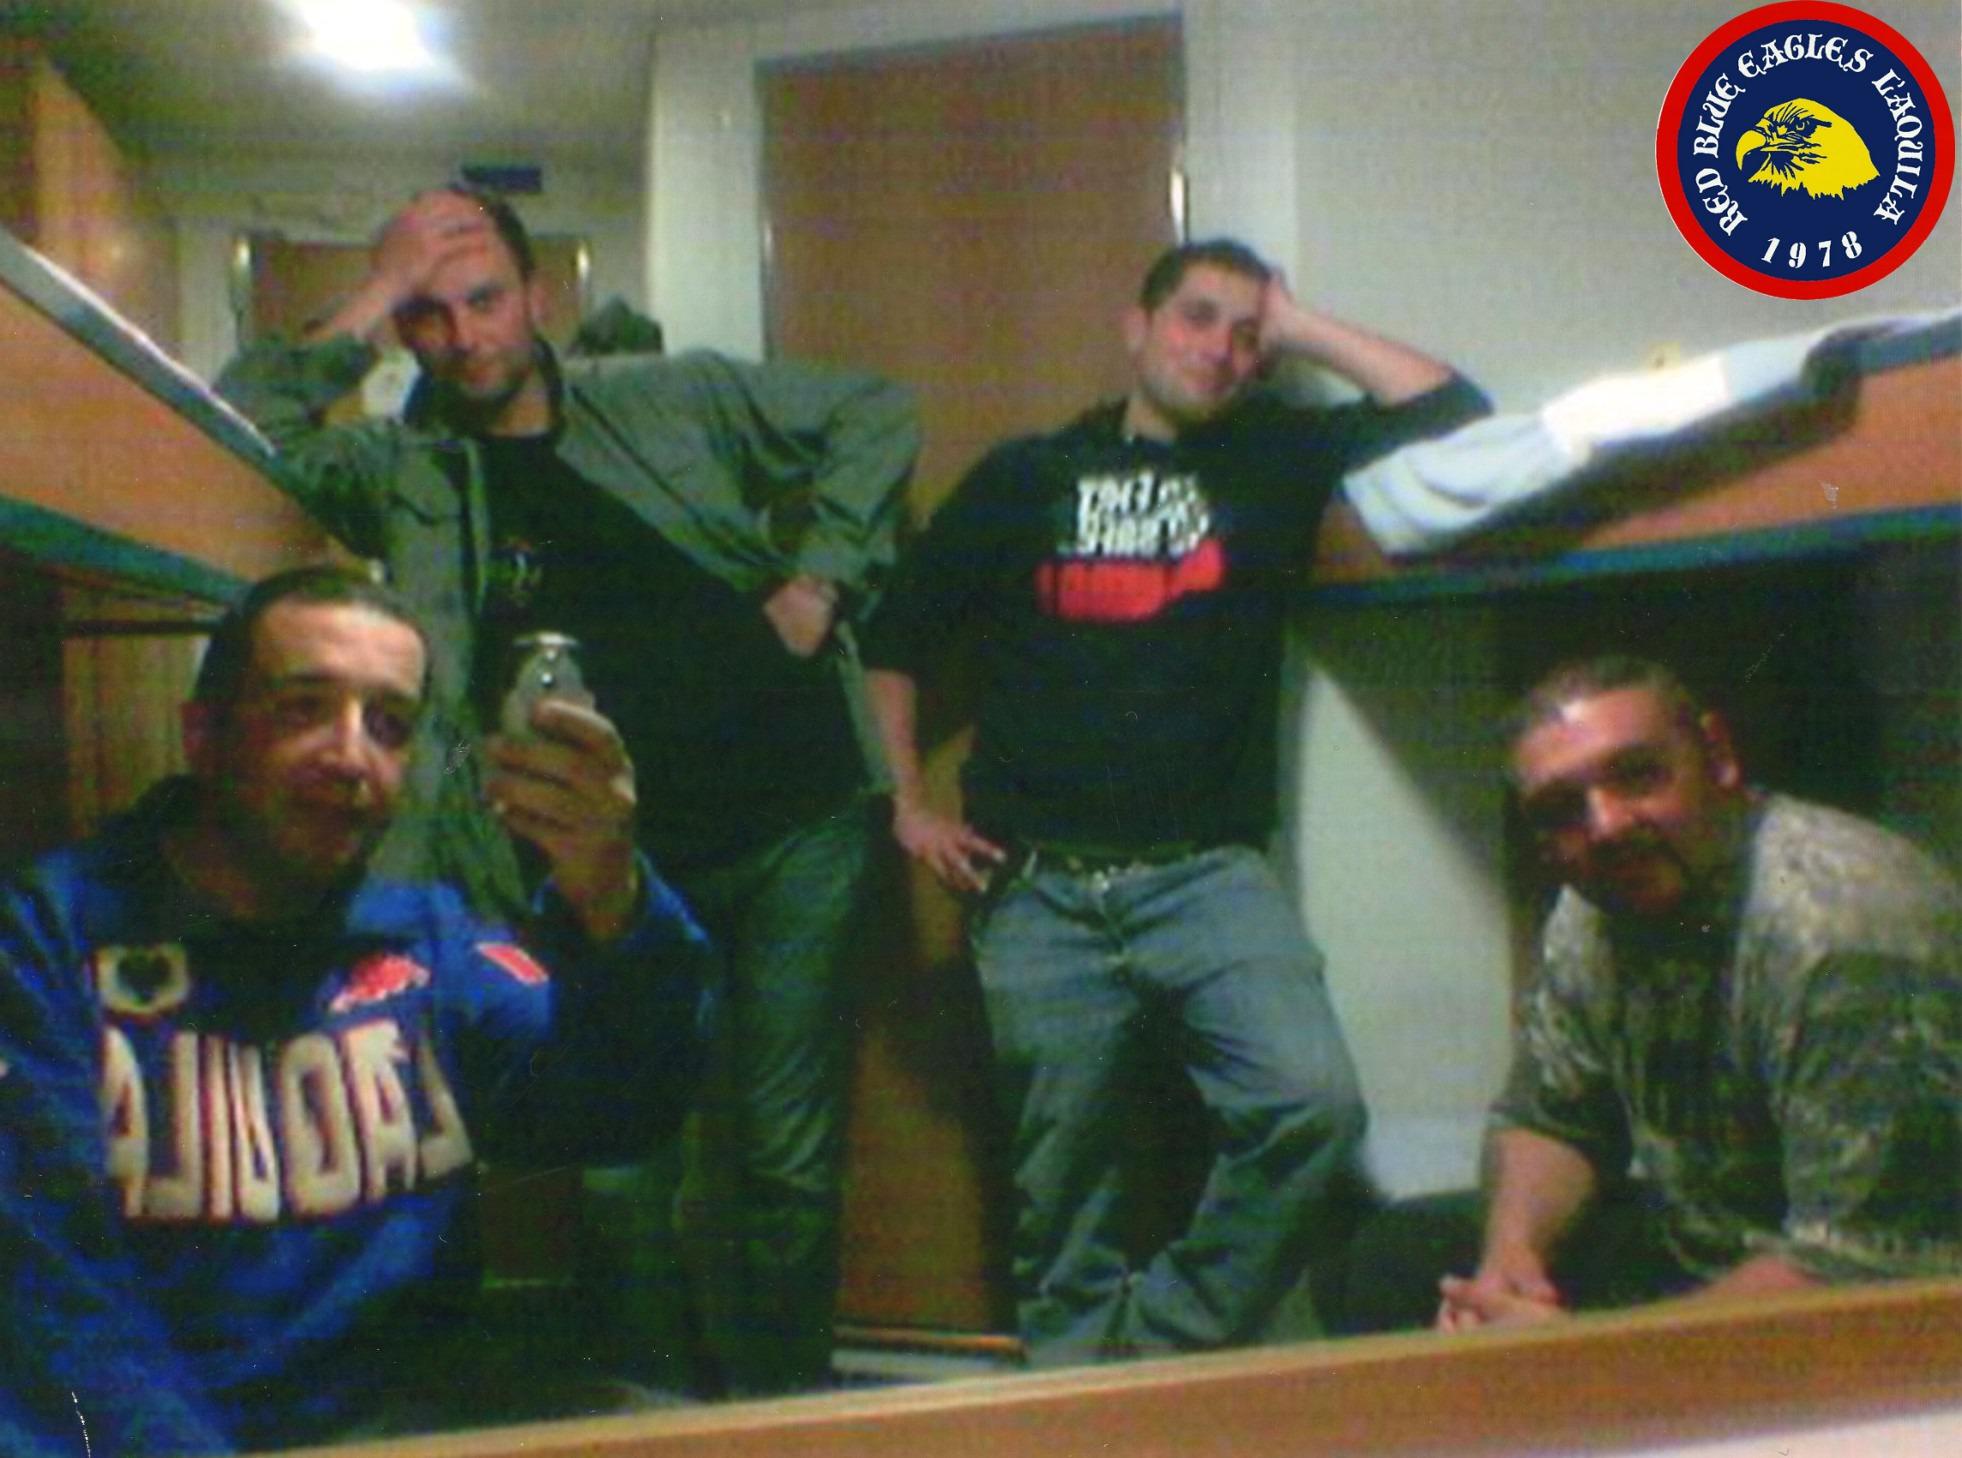 Castelsardo(Sardegna)-L\'Aquila quarti di Coppa Italia Eccellenza Mercoledi 18/04/2007